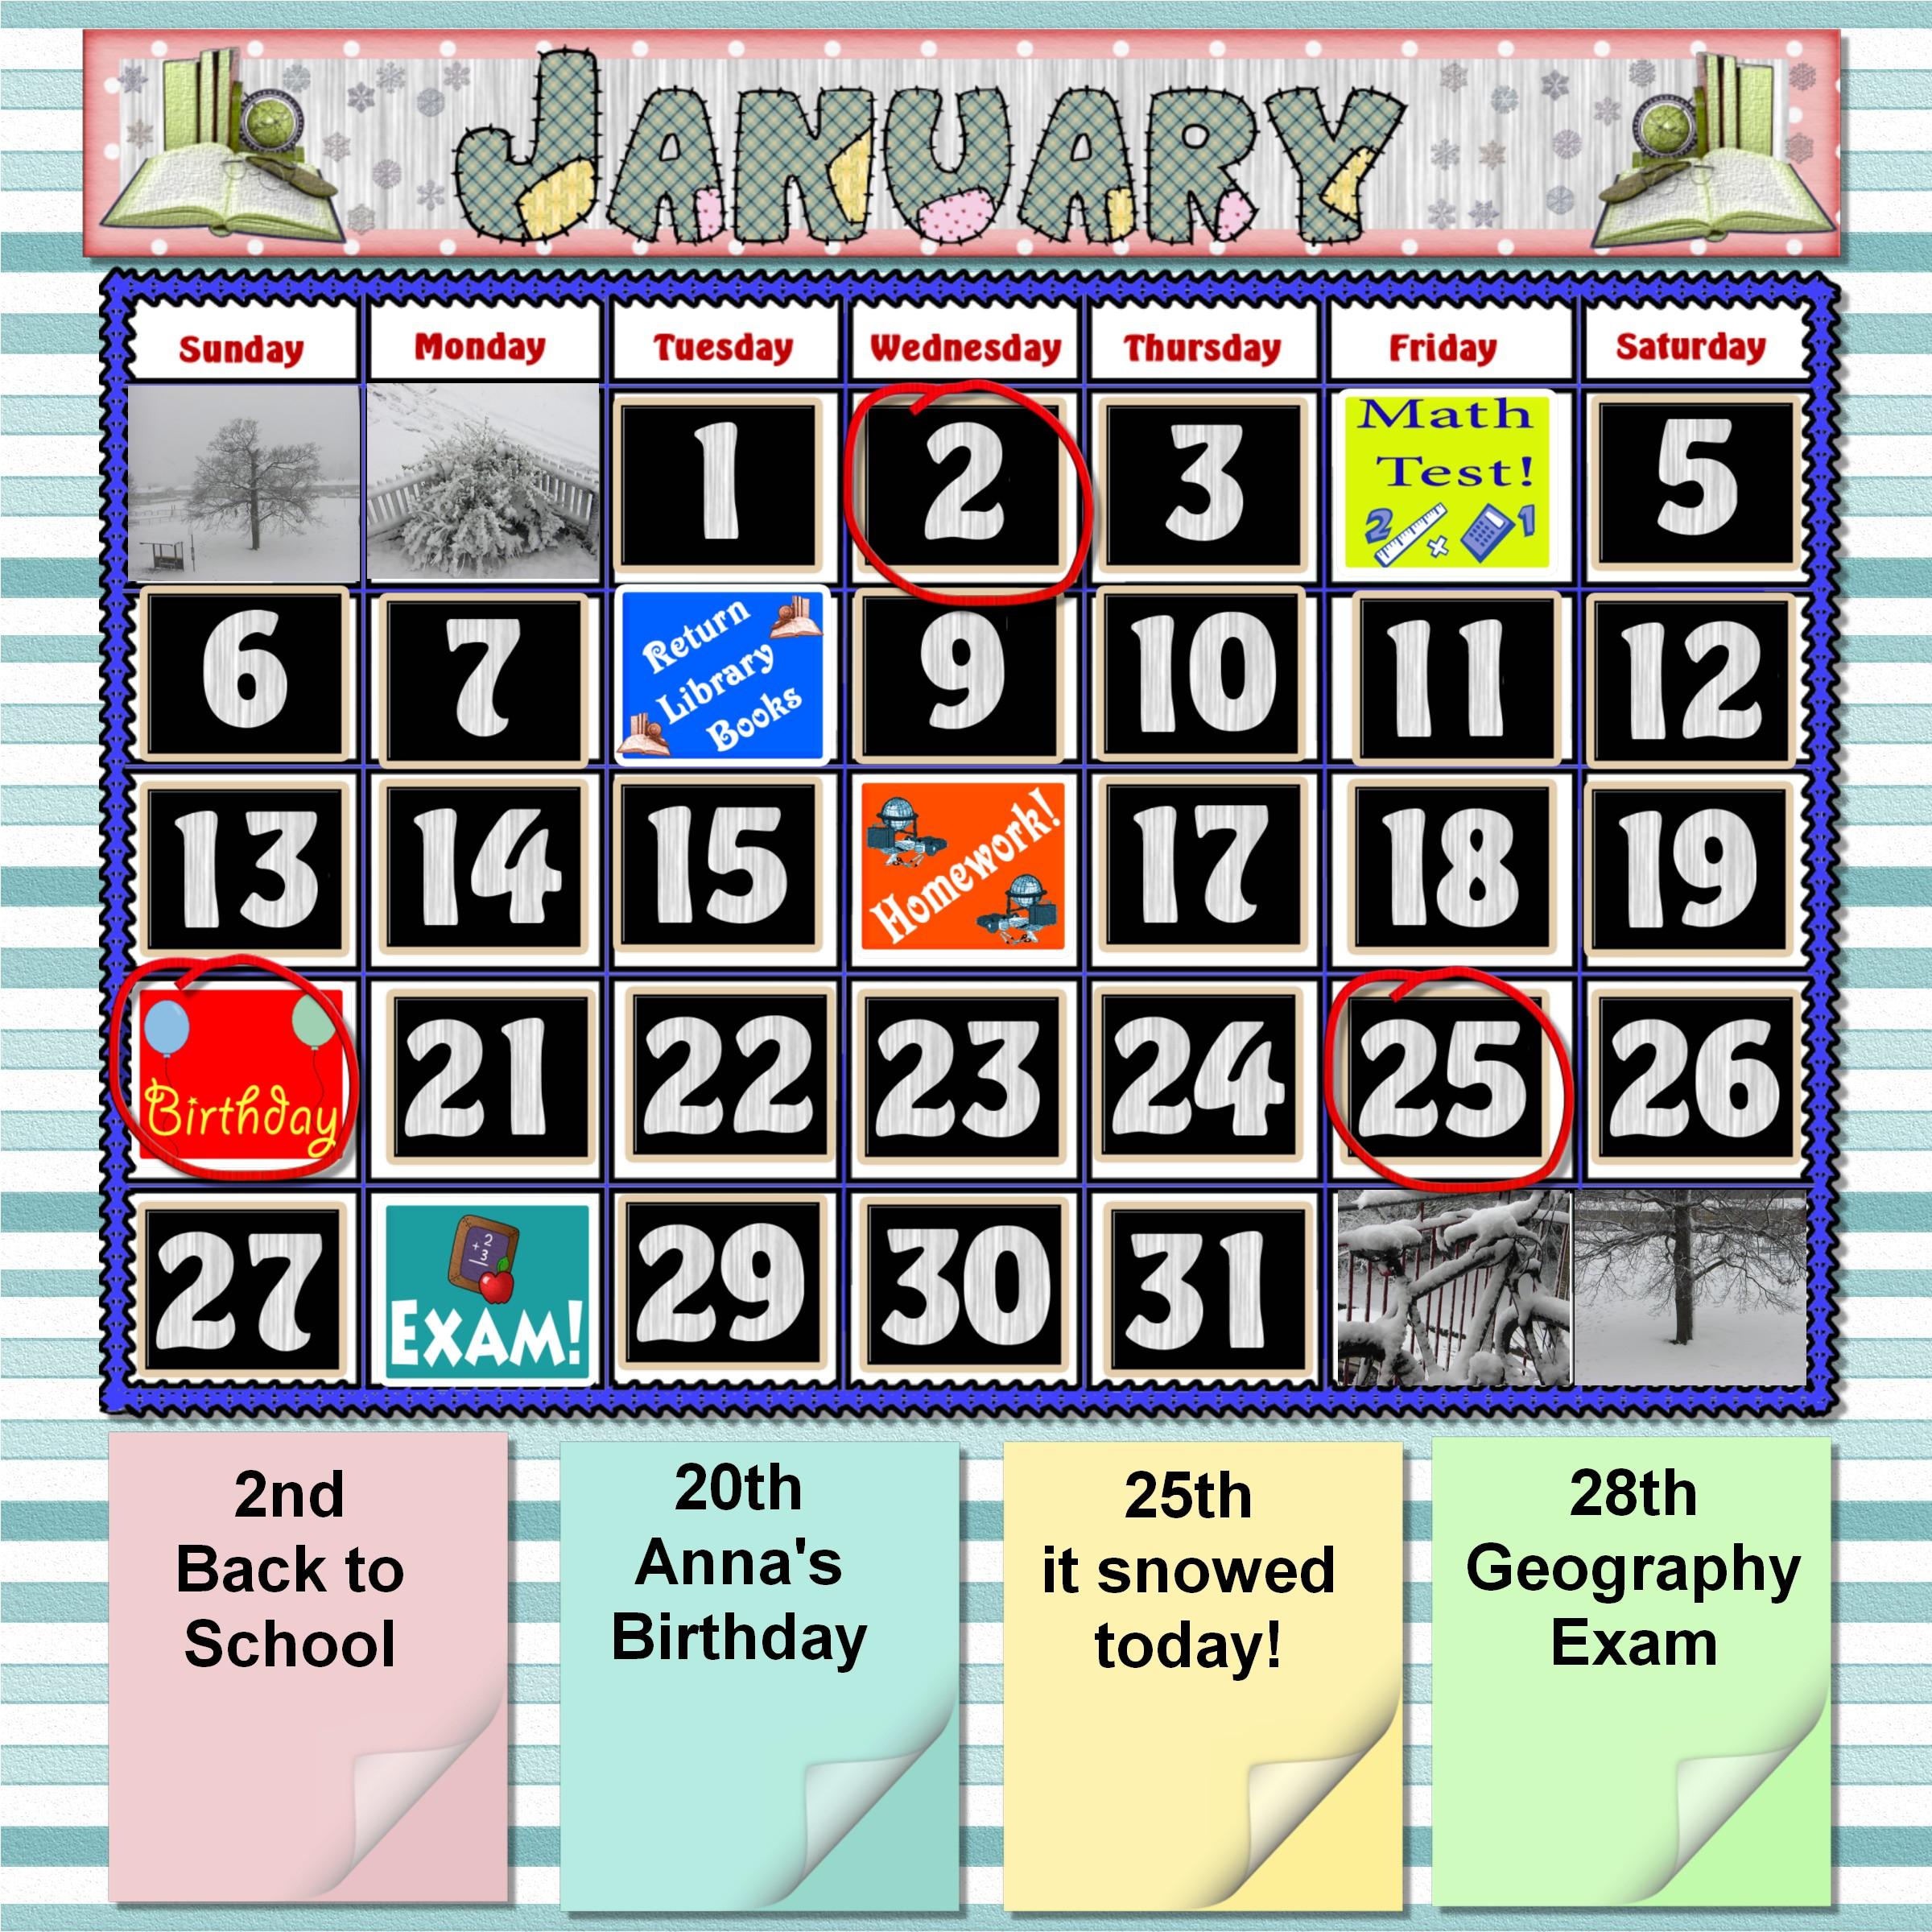 Merit Aid Madness by Stephen Burd | The Washington Monthly calendar ...